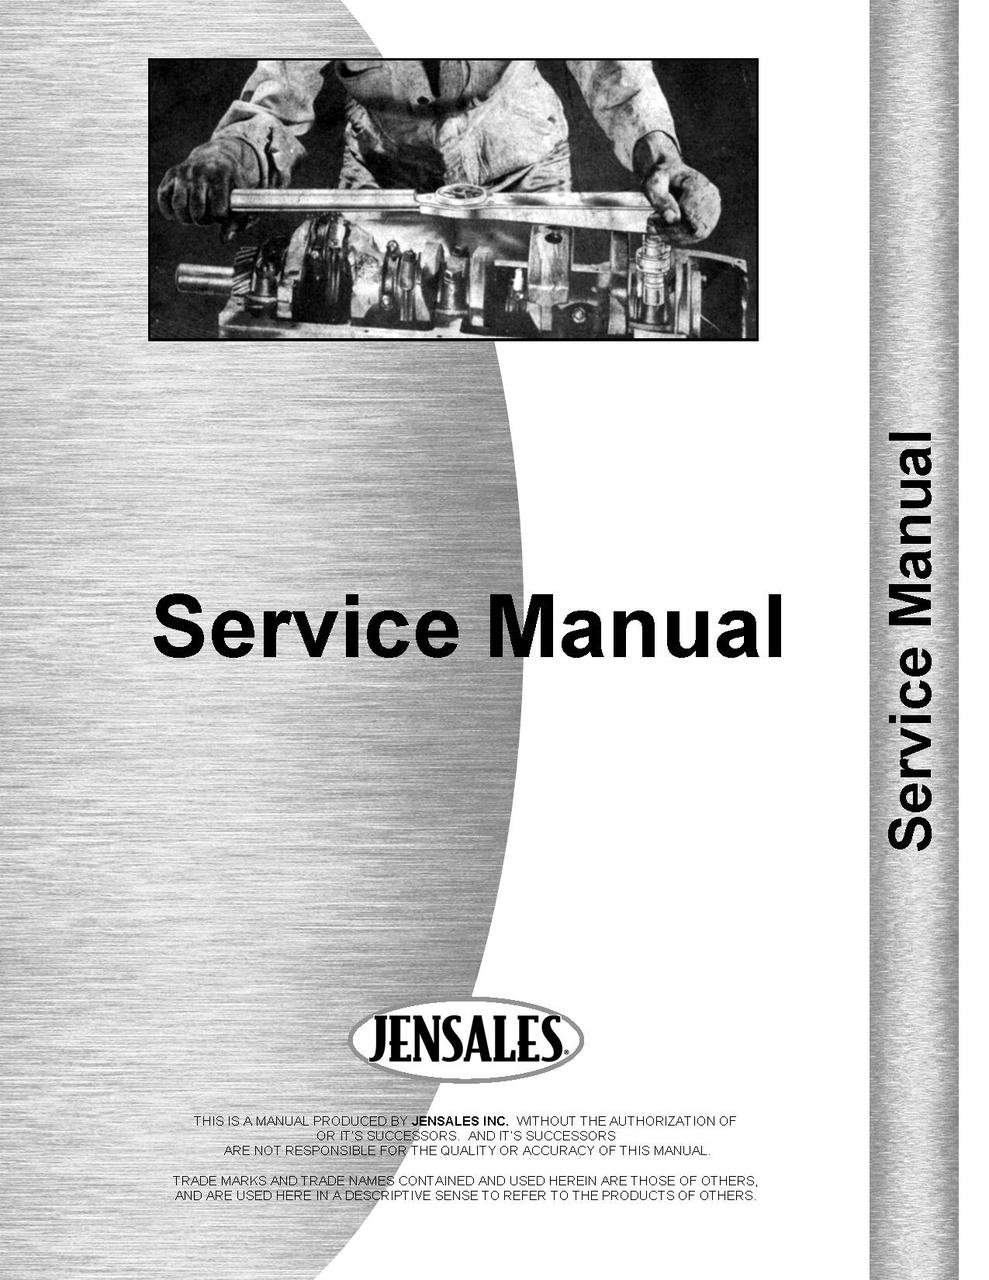 caterpillar 3204 engine service manual rh agkits com Caterpillar 3204 Engine Parts Remanufactured 3204 Engine